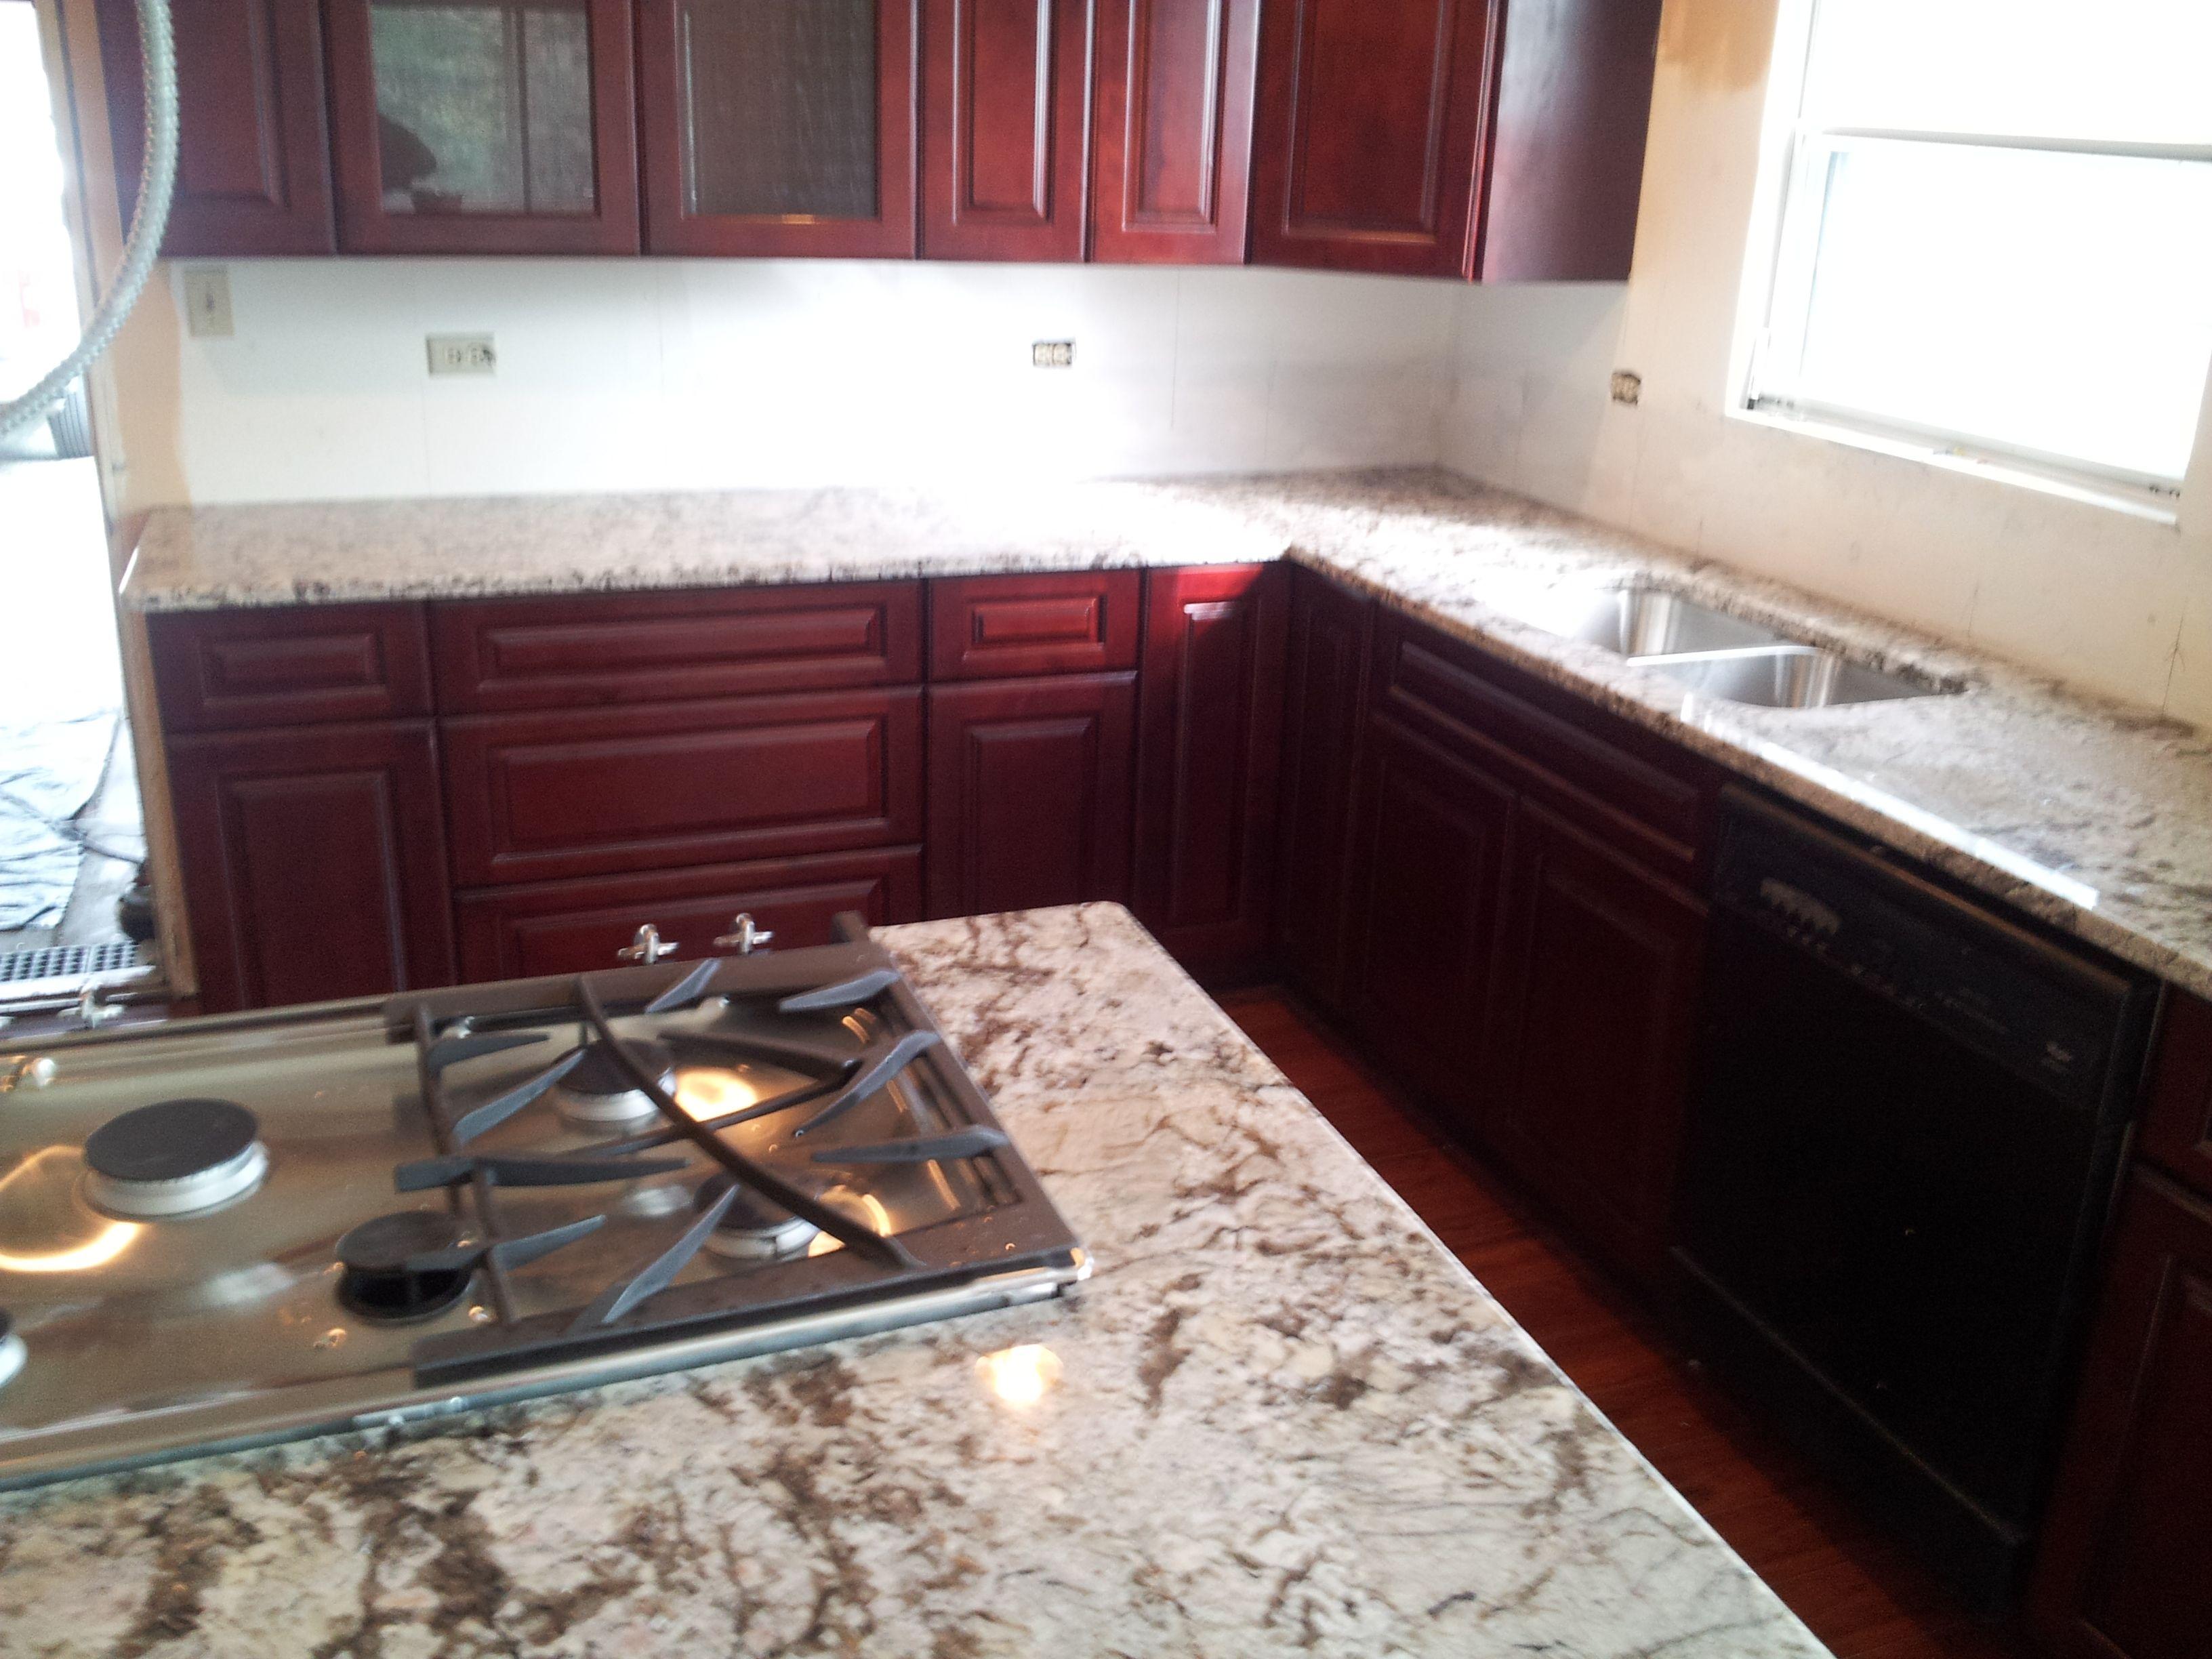 Bon Art Granite Countertops Inc. 1020 Lunt Ave . Unit F Schaumburg IL , 60193  Tel